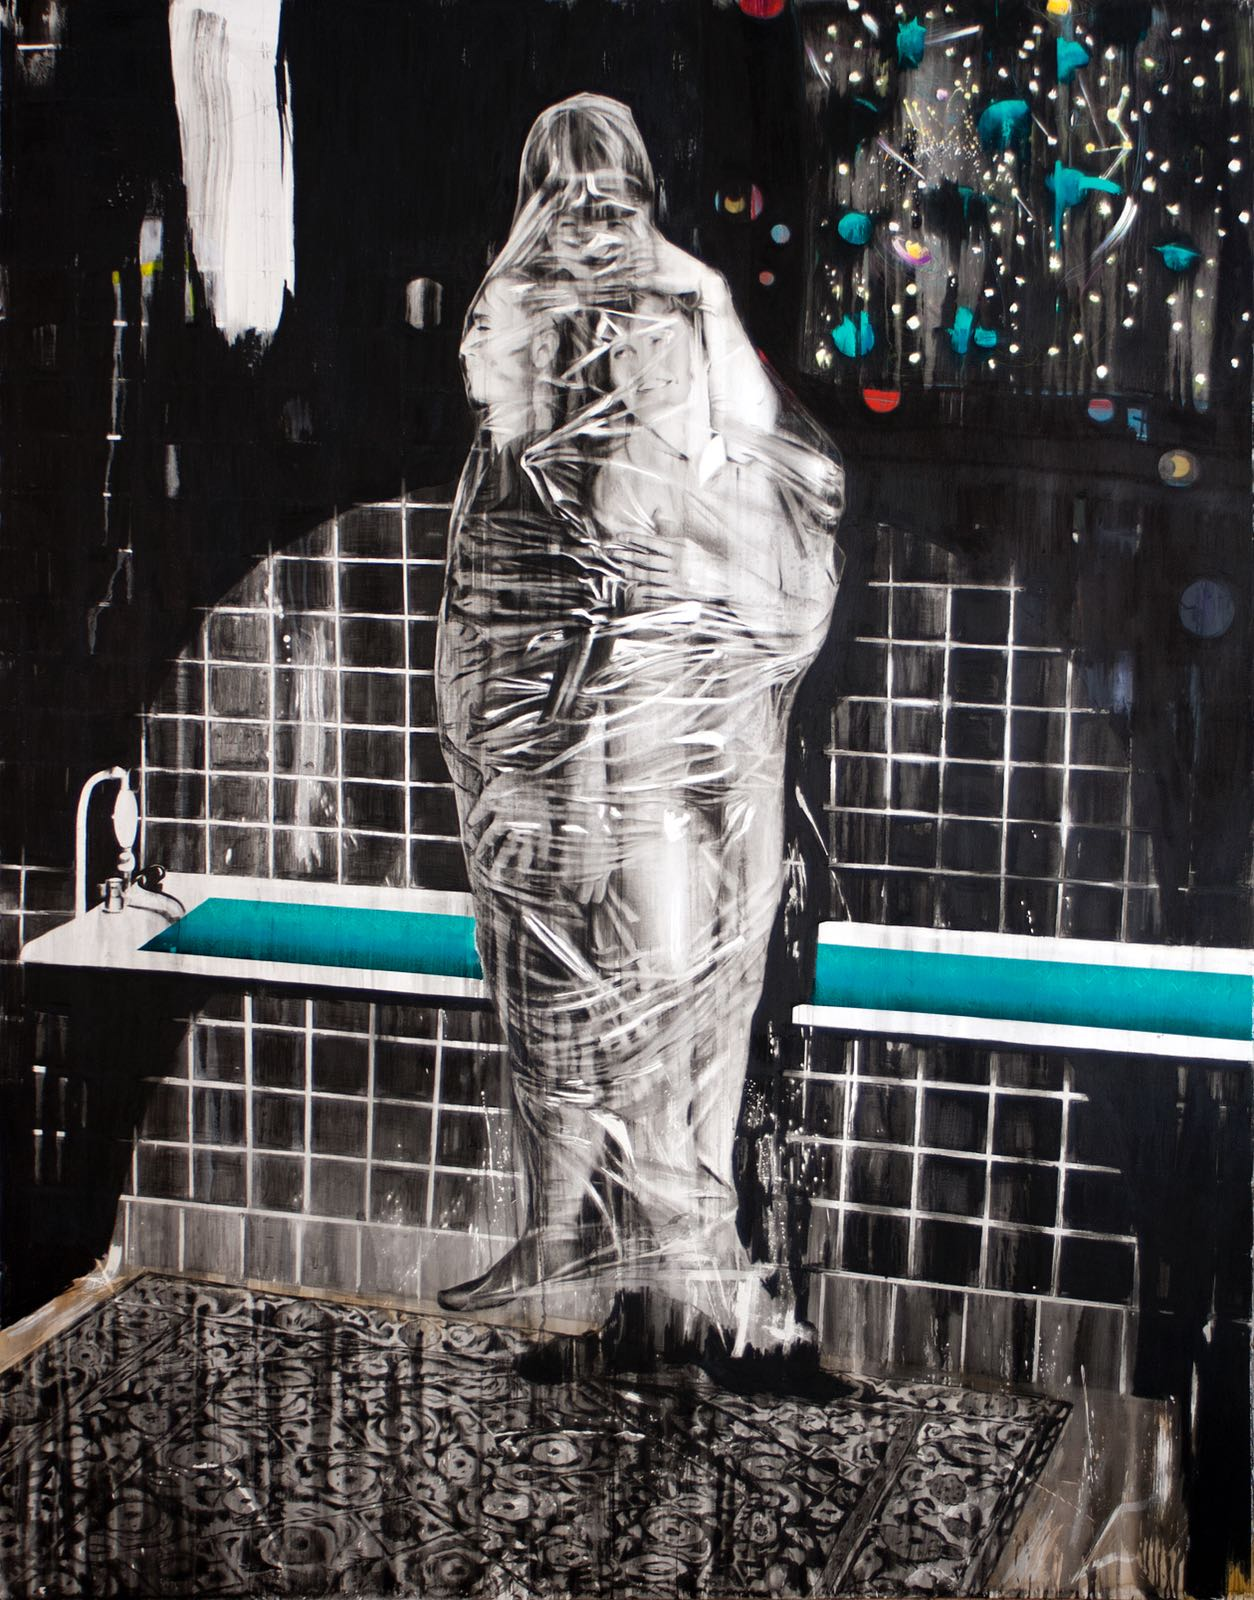 Breaking Ice (2018) - José Luis Puche Nieto